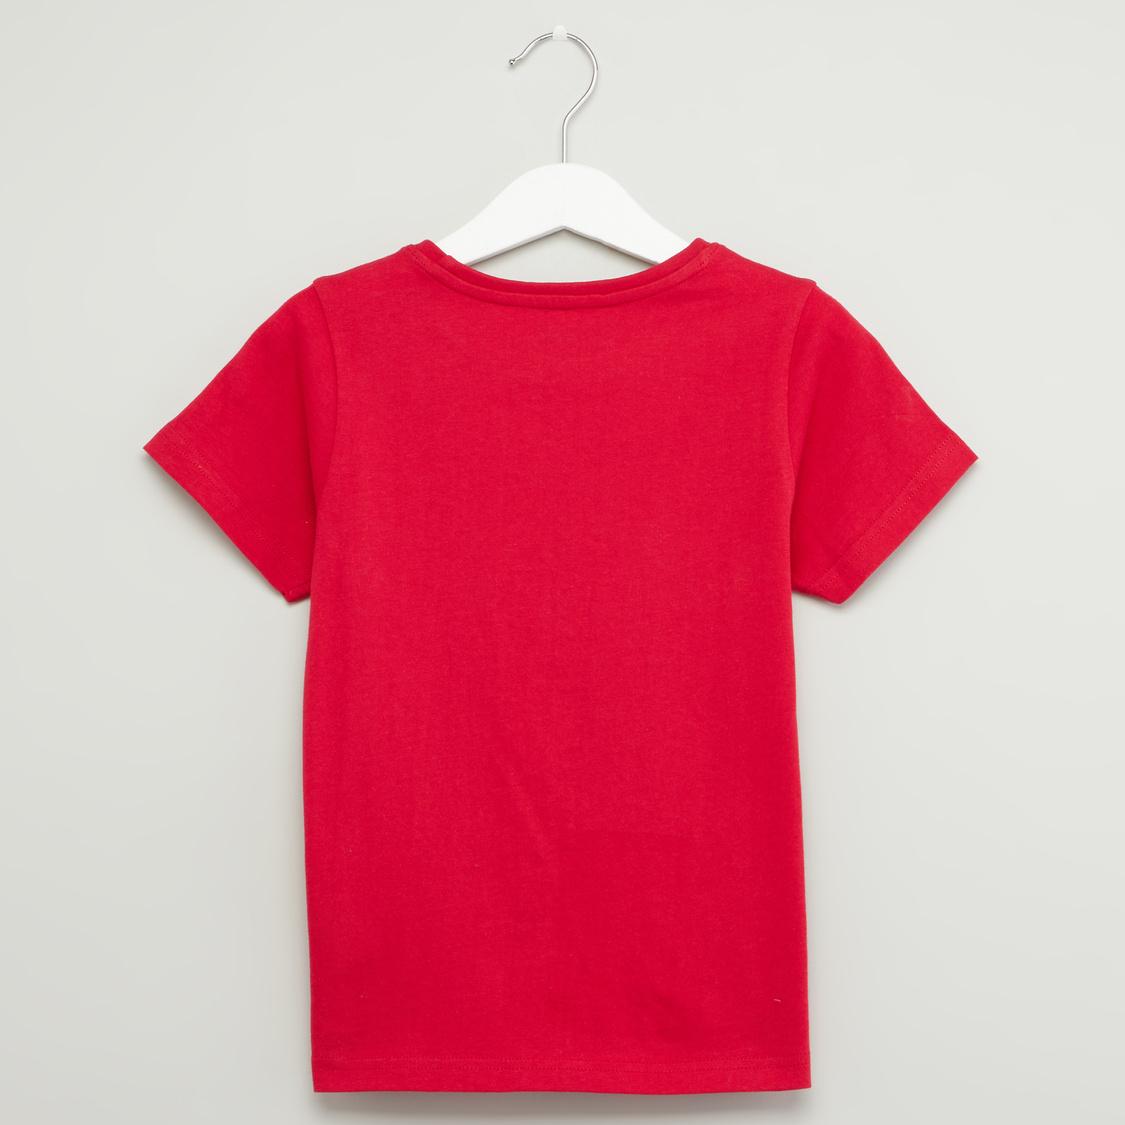 Printed Round Neck T-shirt and Shorts Set